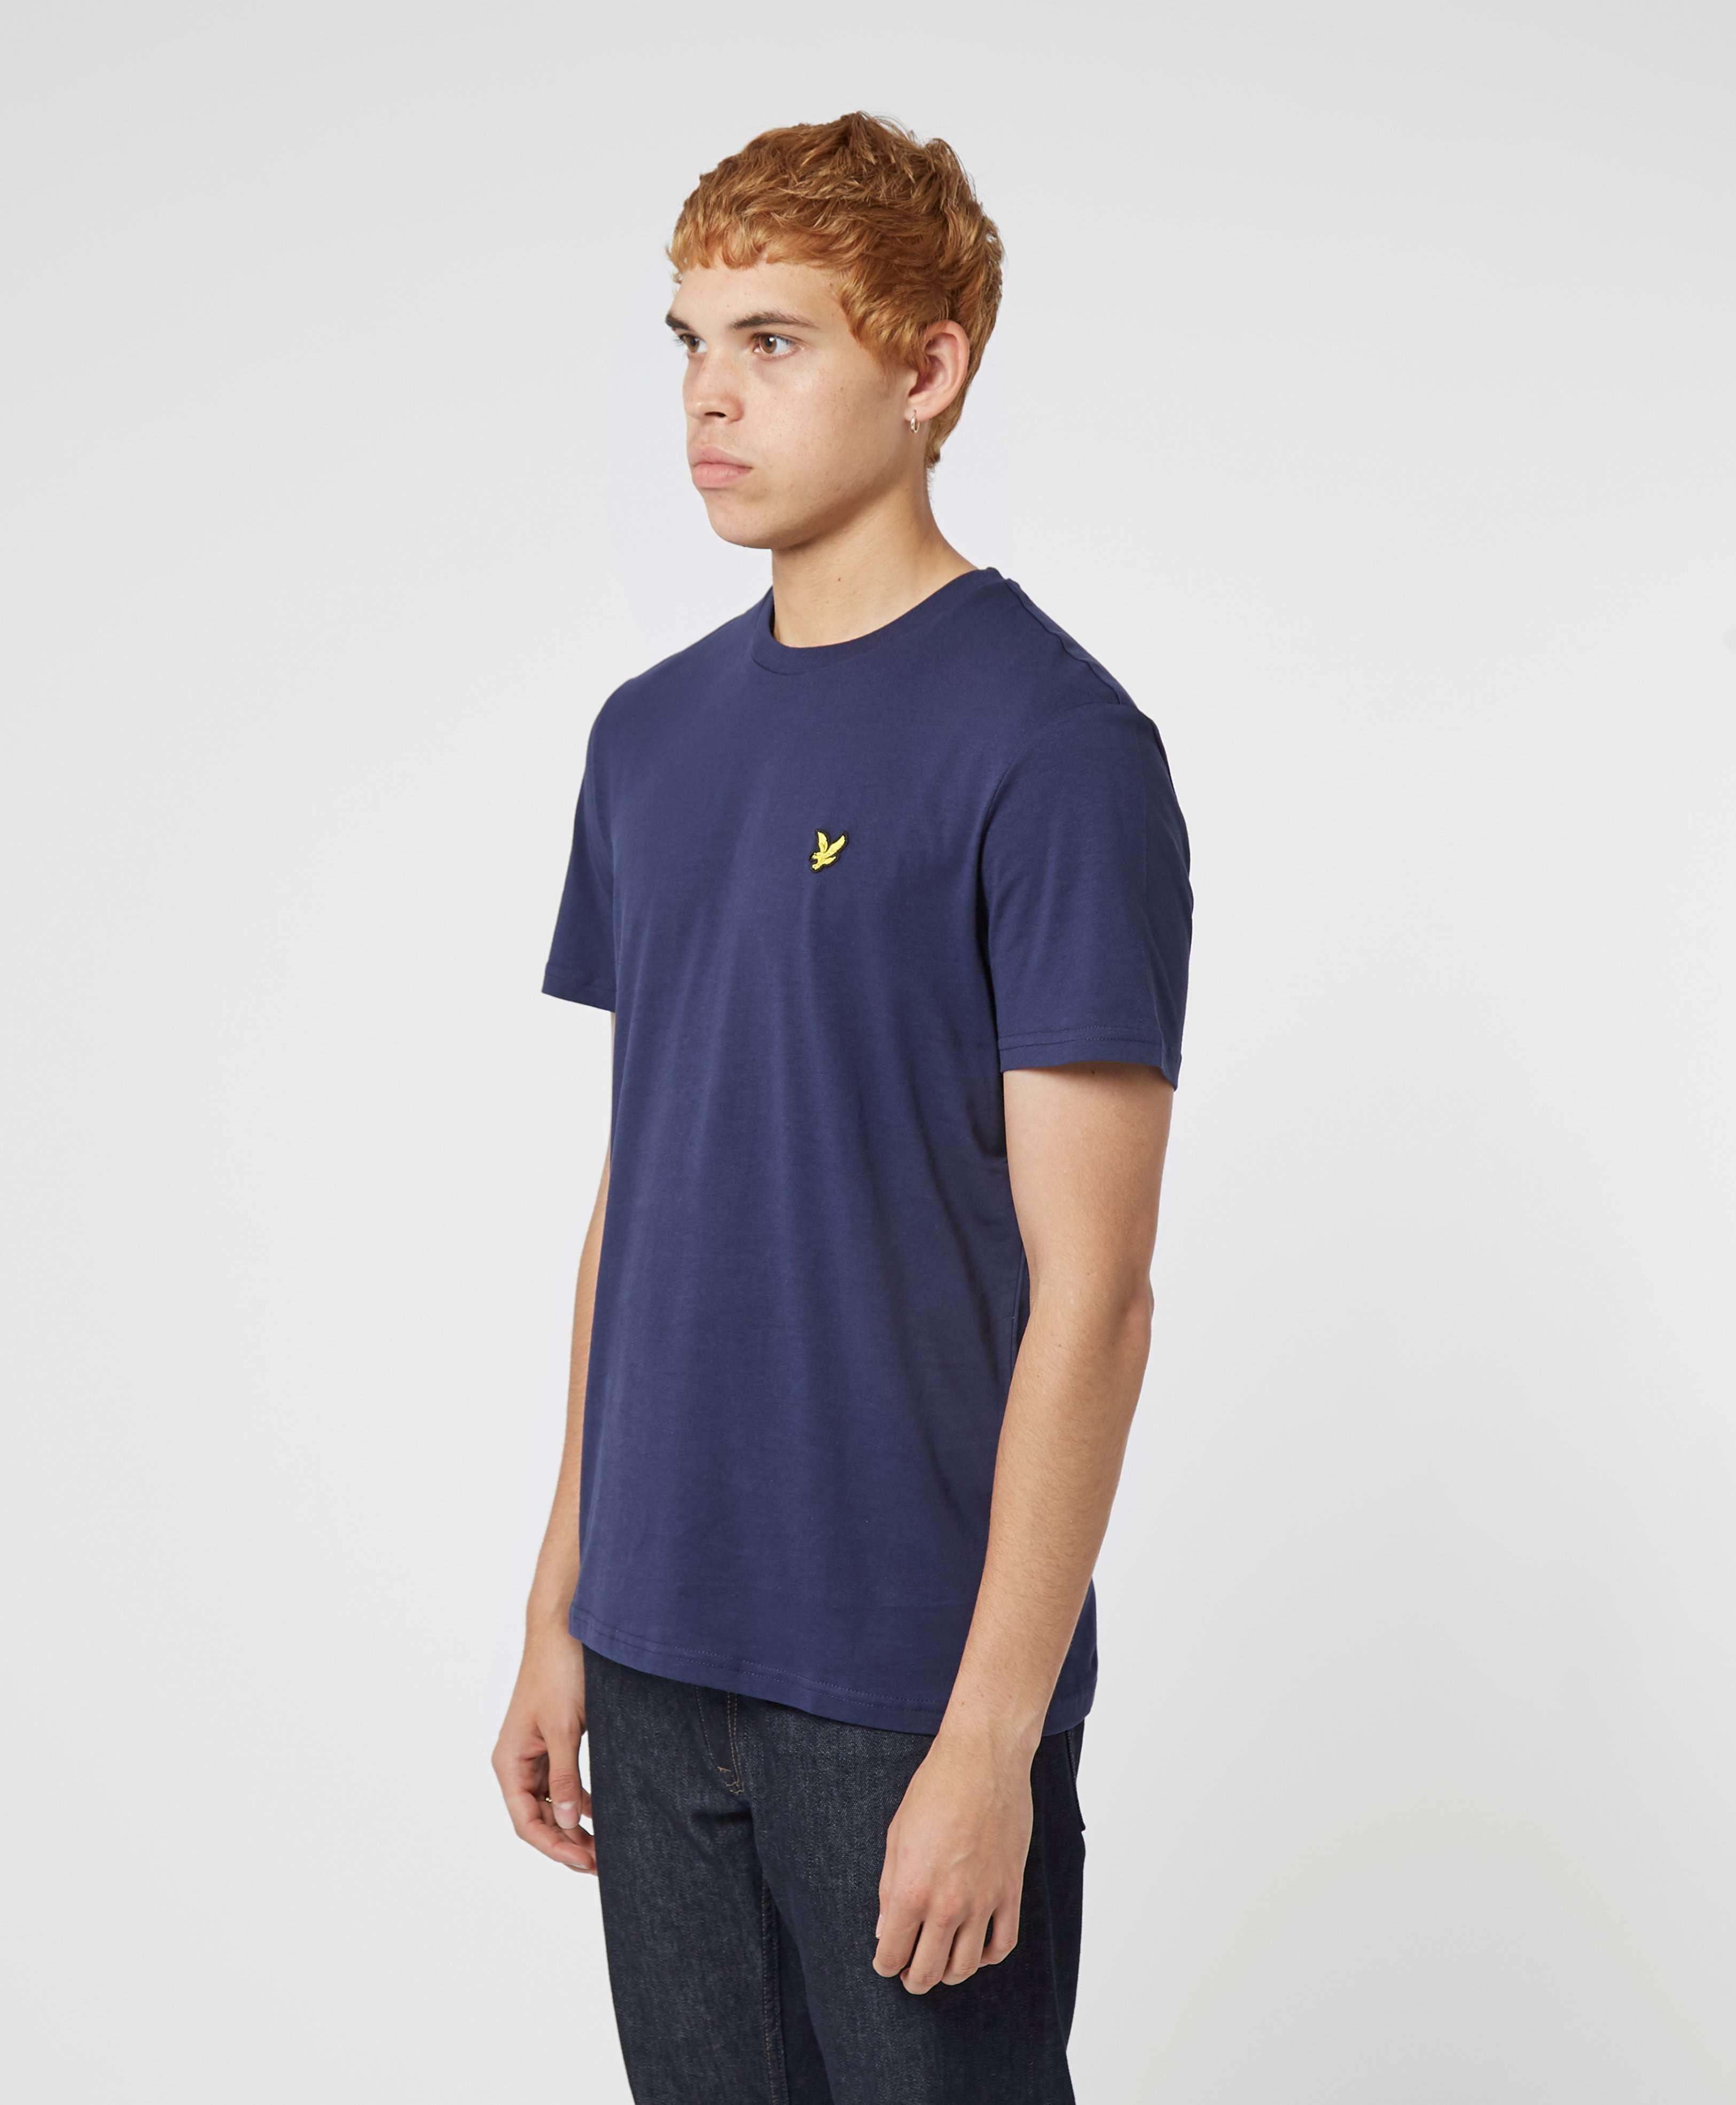 Lyle & Scott Crew Neck Short Sleeve T-Shirt